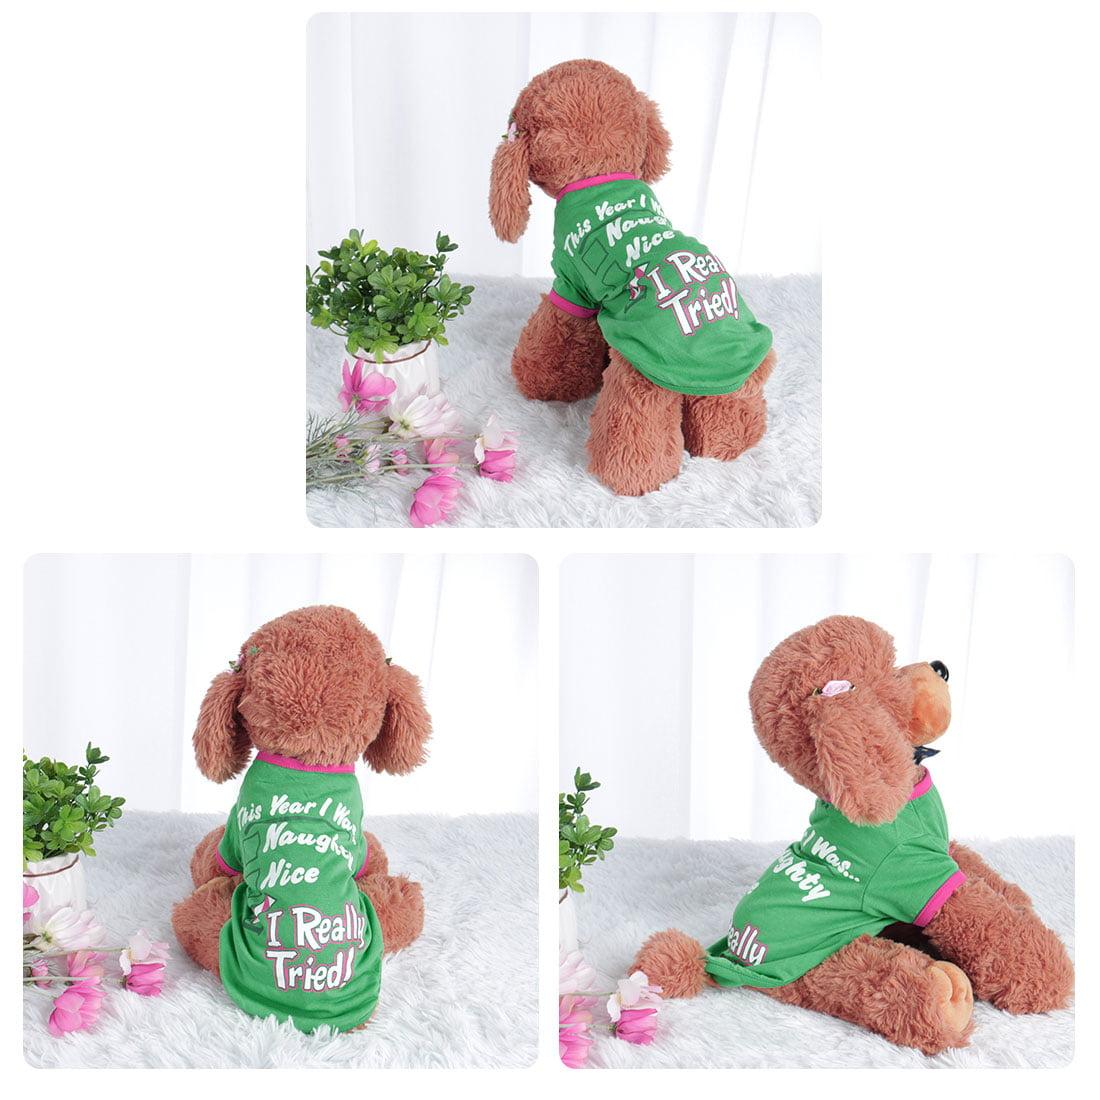 Dog T Shirt Puppy Small Pet Sweatshirt Tops Clothes Apparel Vest Costume #2, L - image 1 of 7